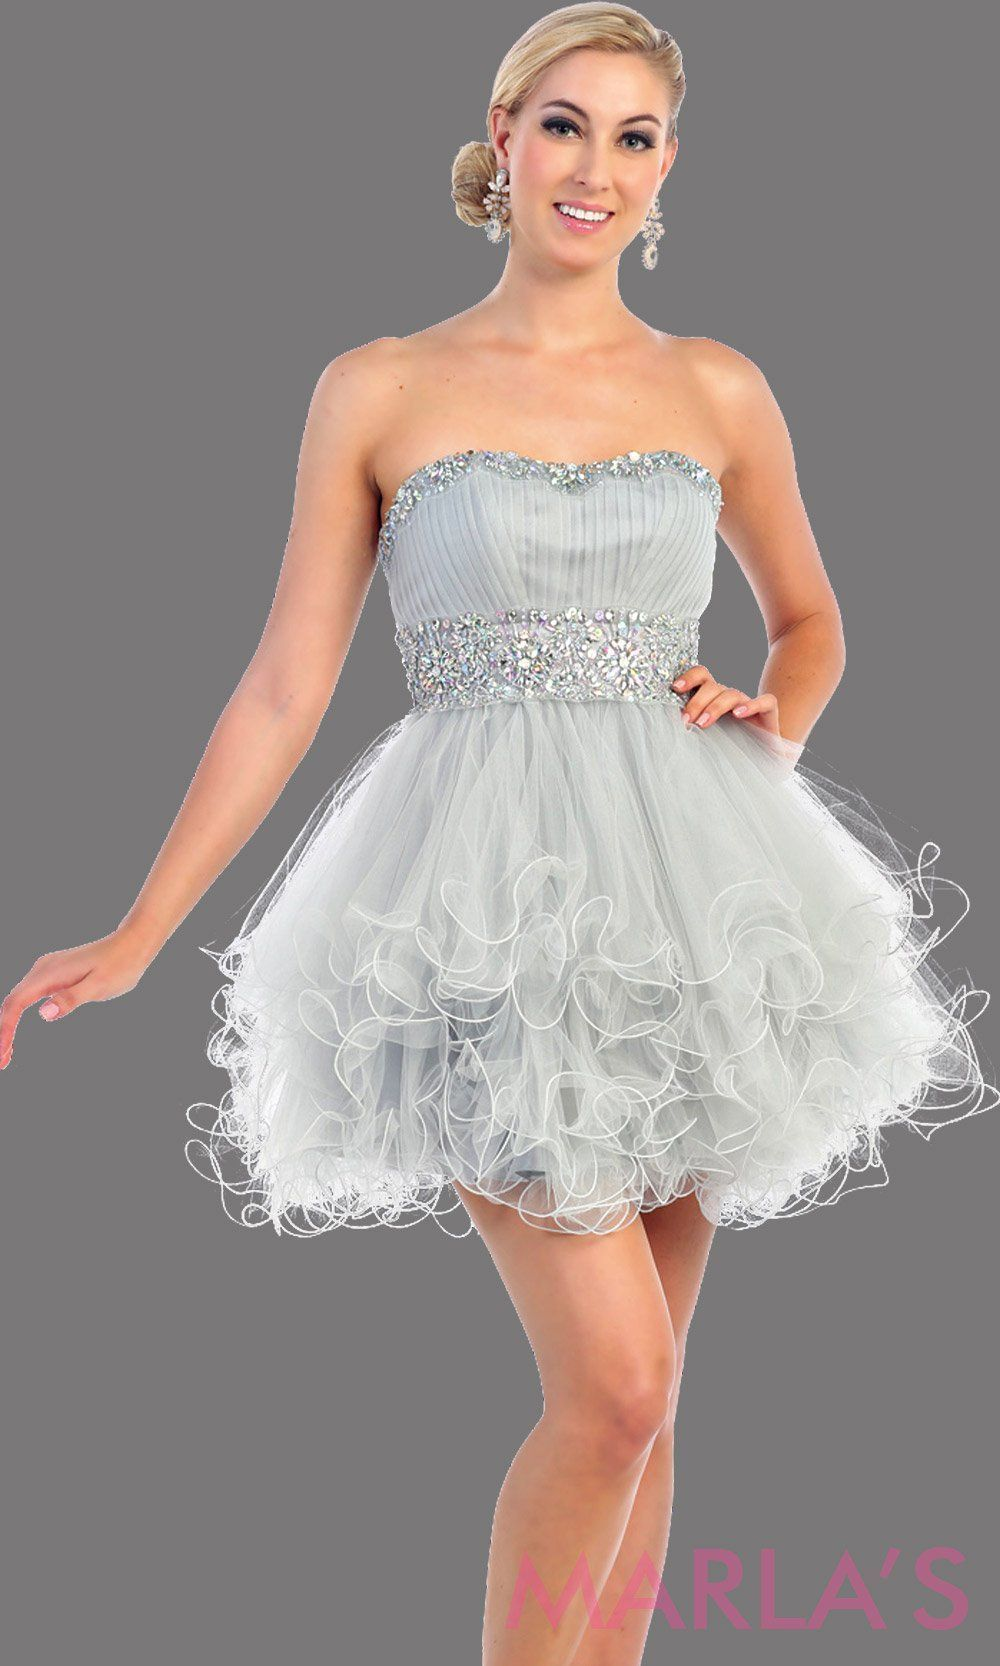 3ce9f8699ed06 Short silver strapless grade 8 grad puffy dress with rhinestone  waistline.This light gray grade 8 graduation dress has a corset back.